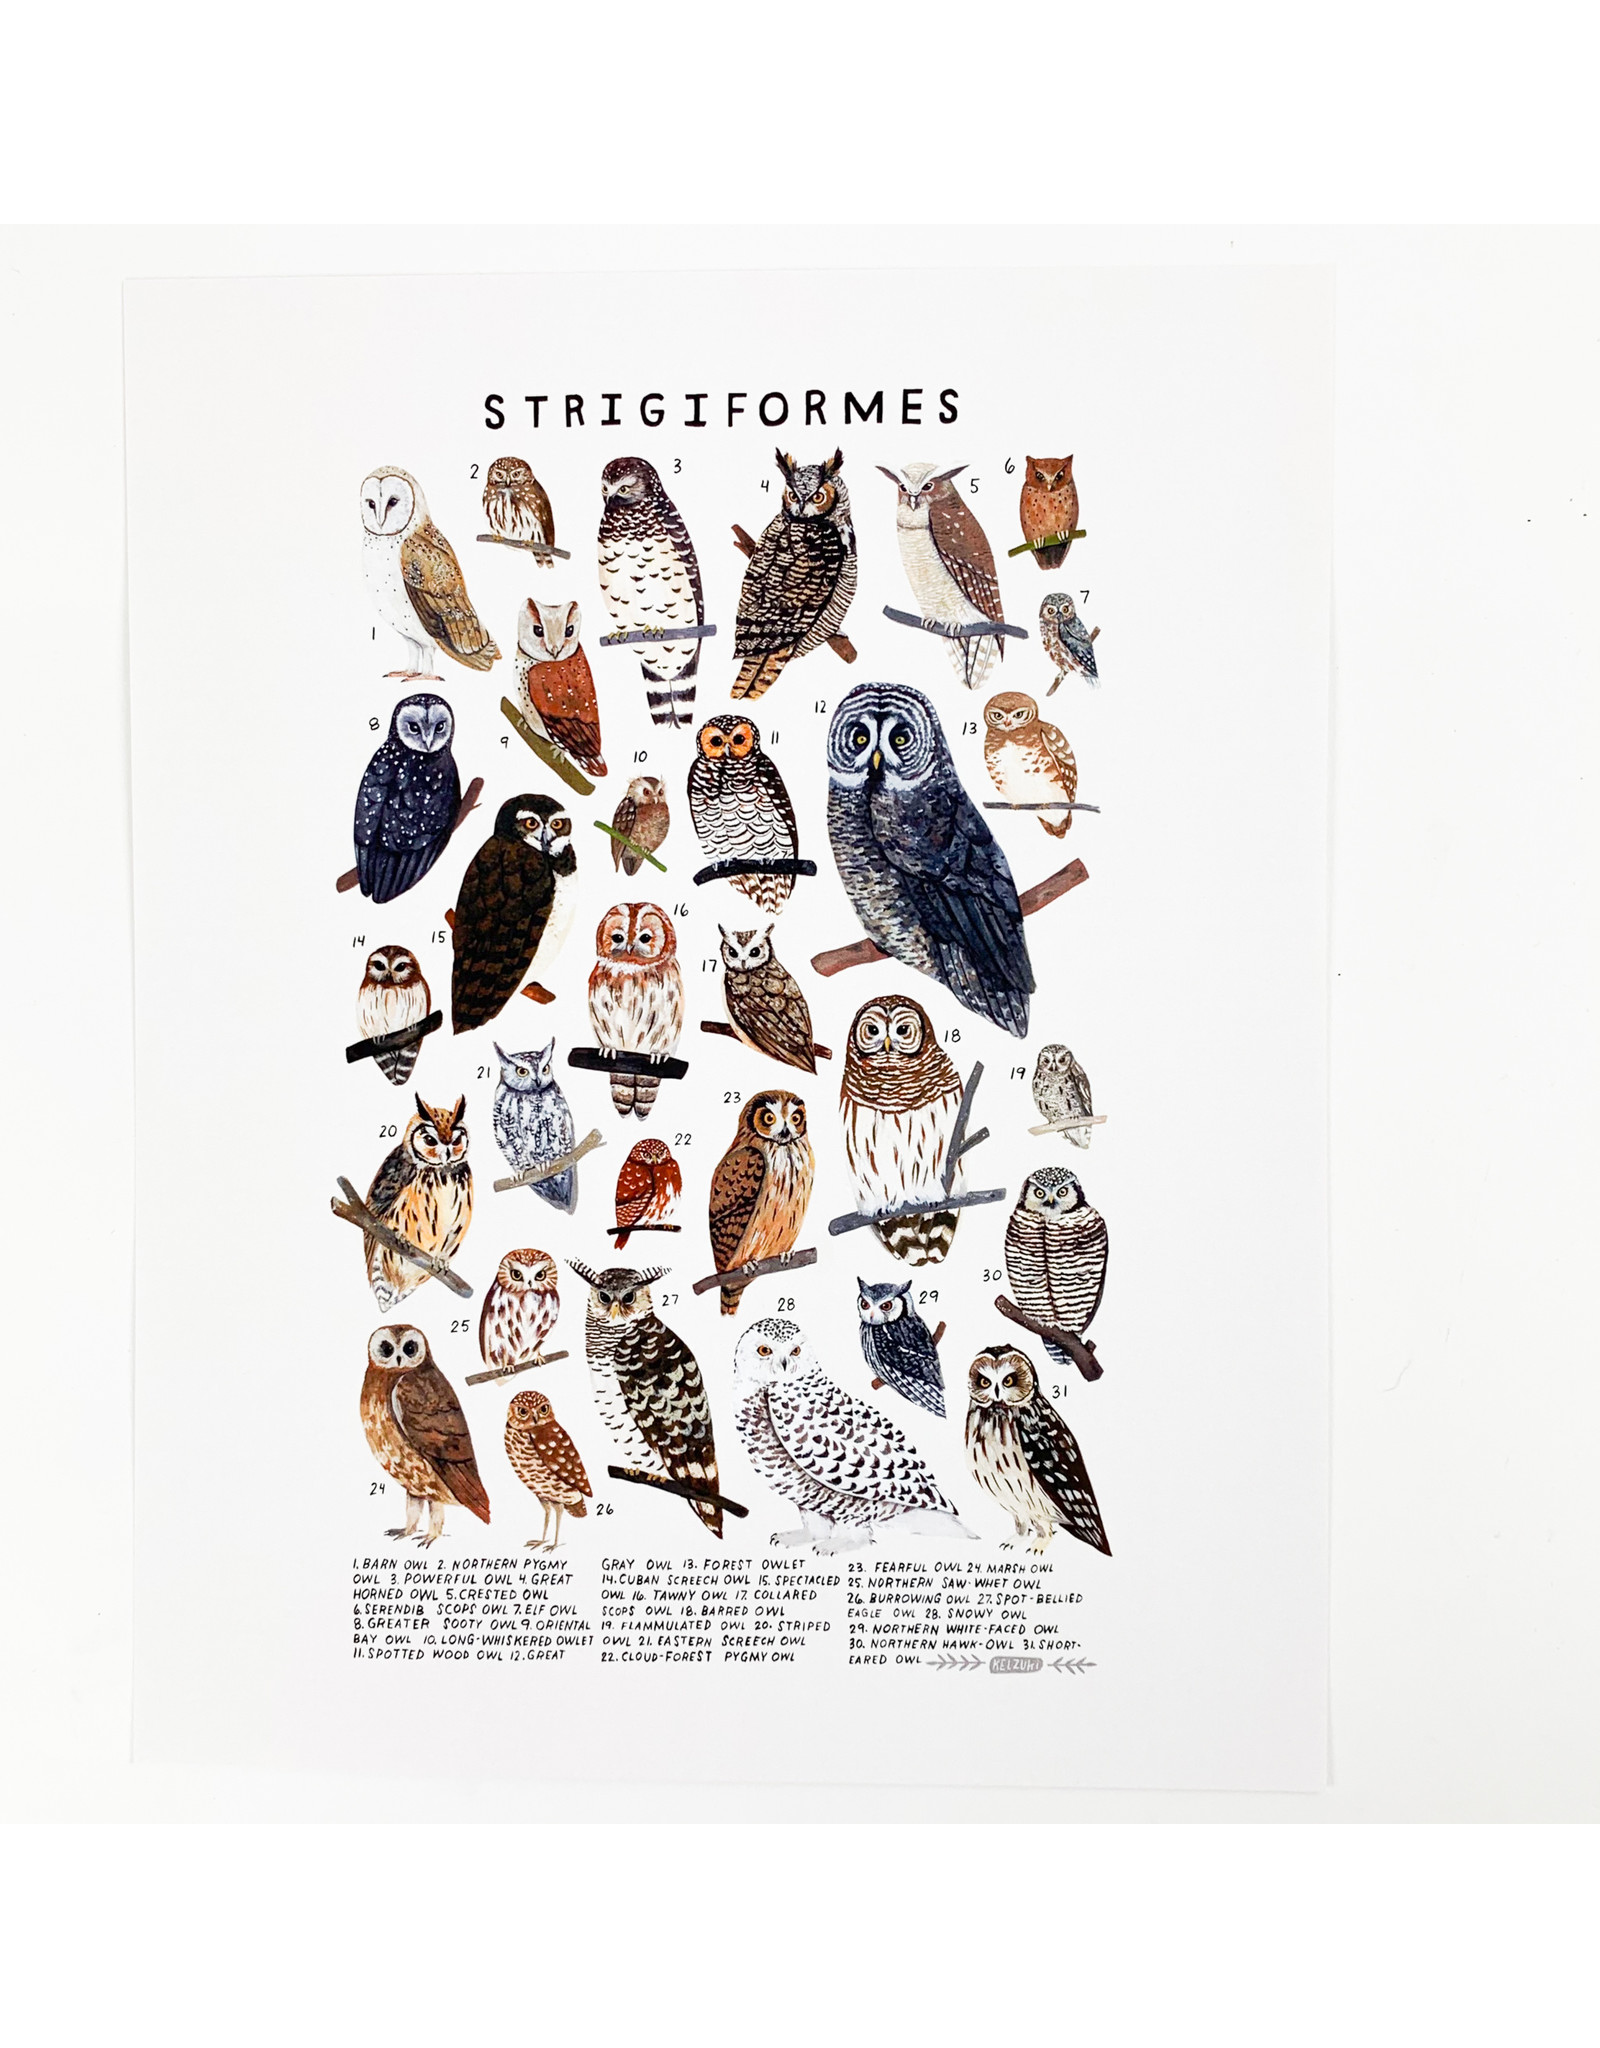 Kelzuki/Consignment Strigiformes prints/Consignment